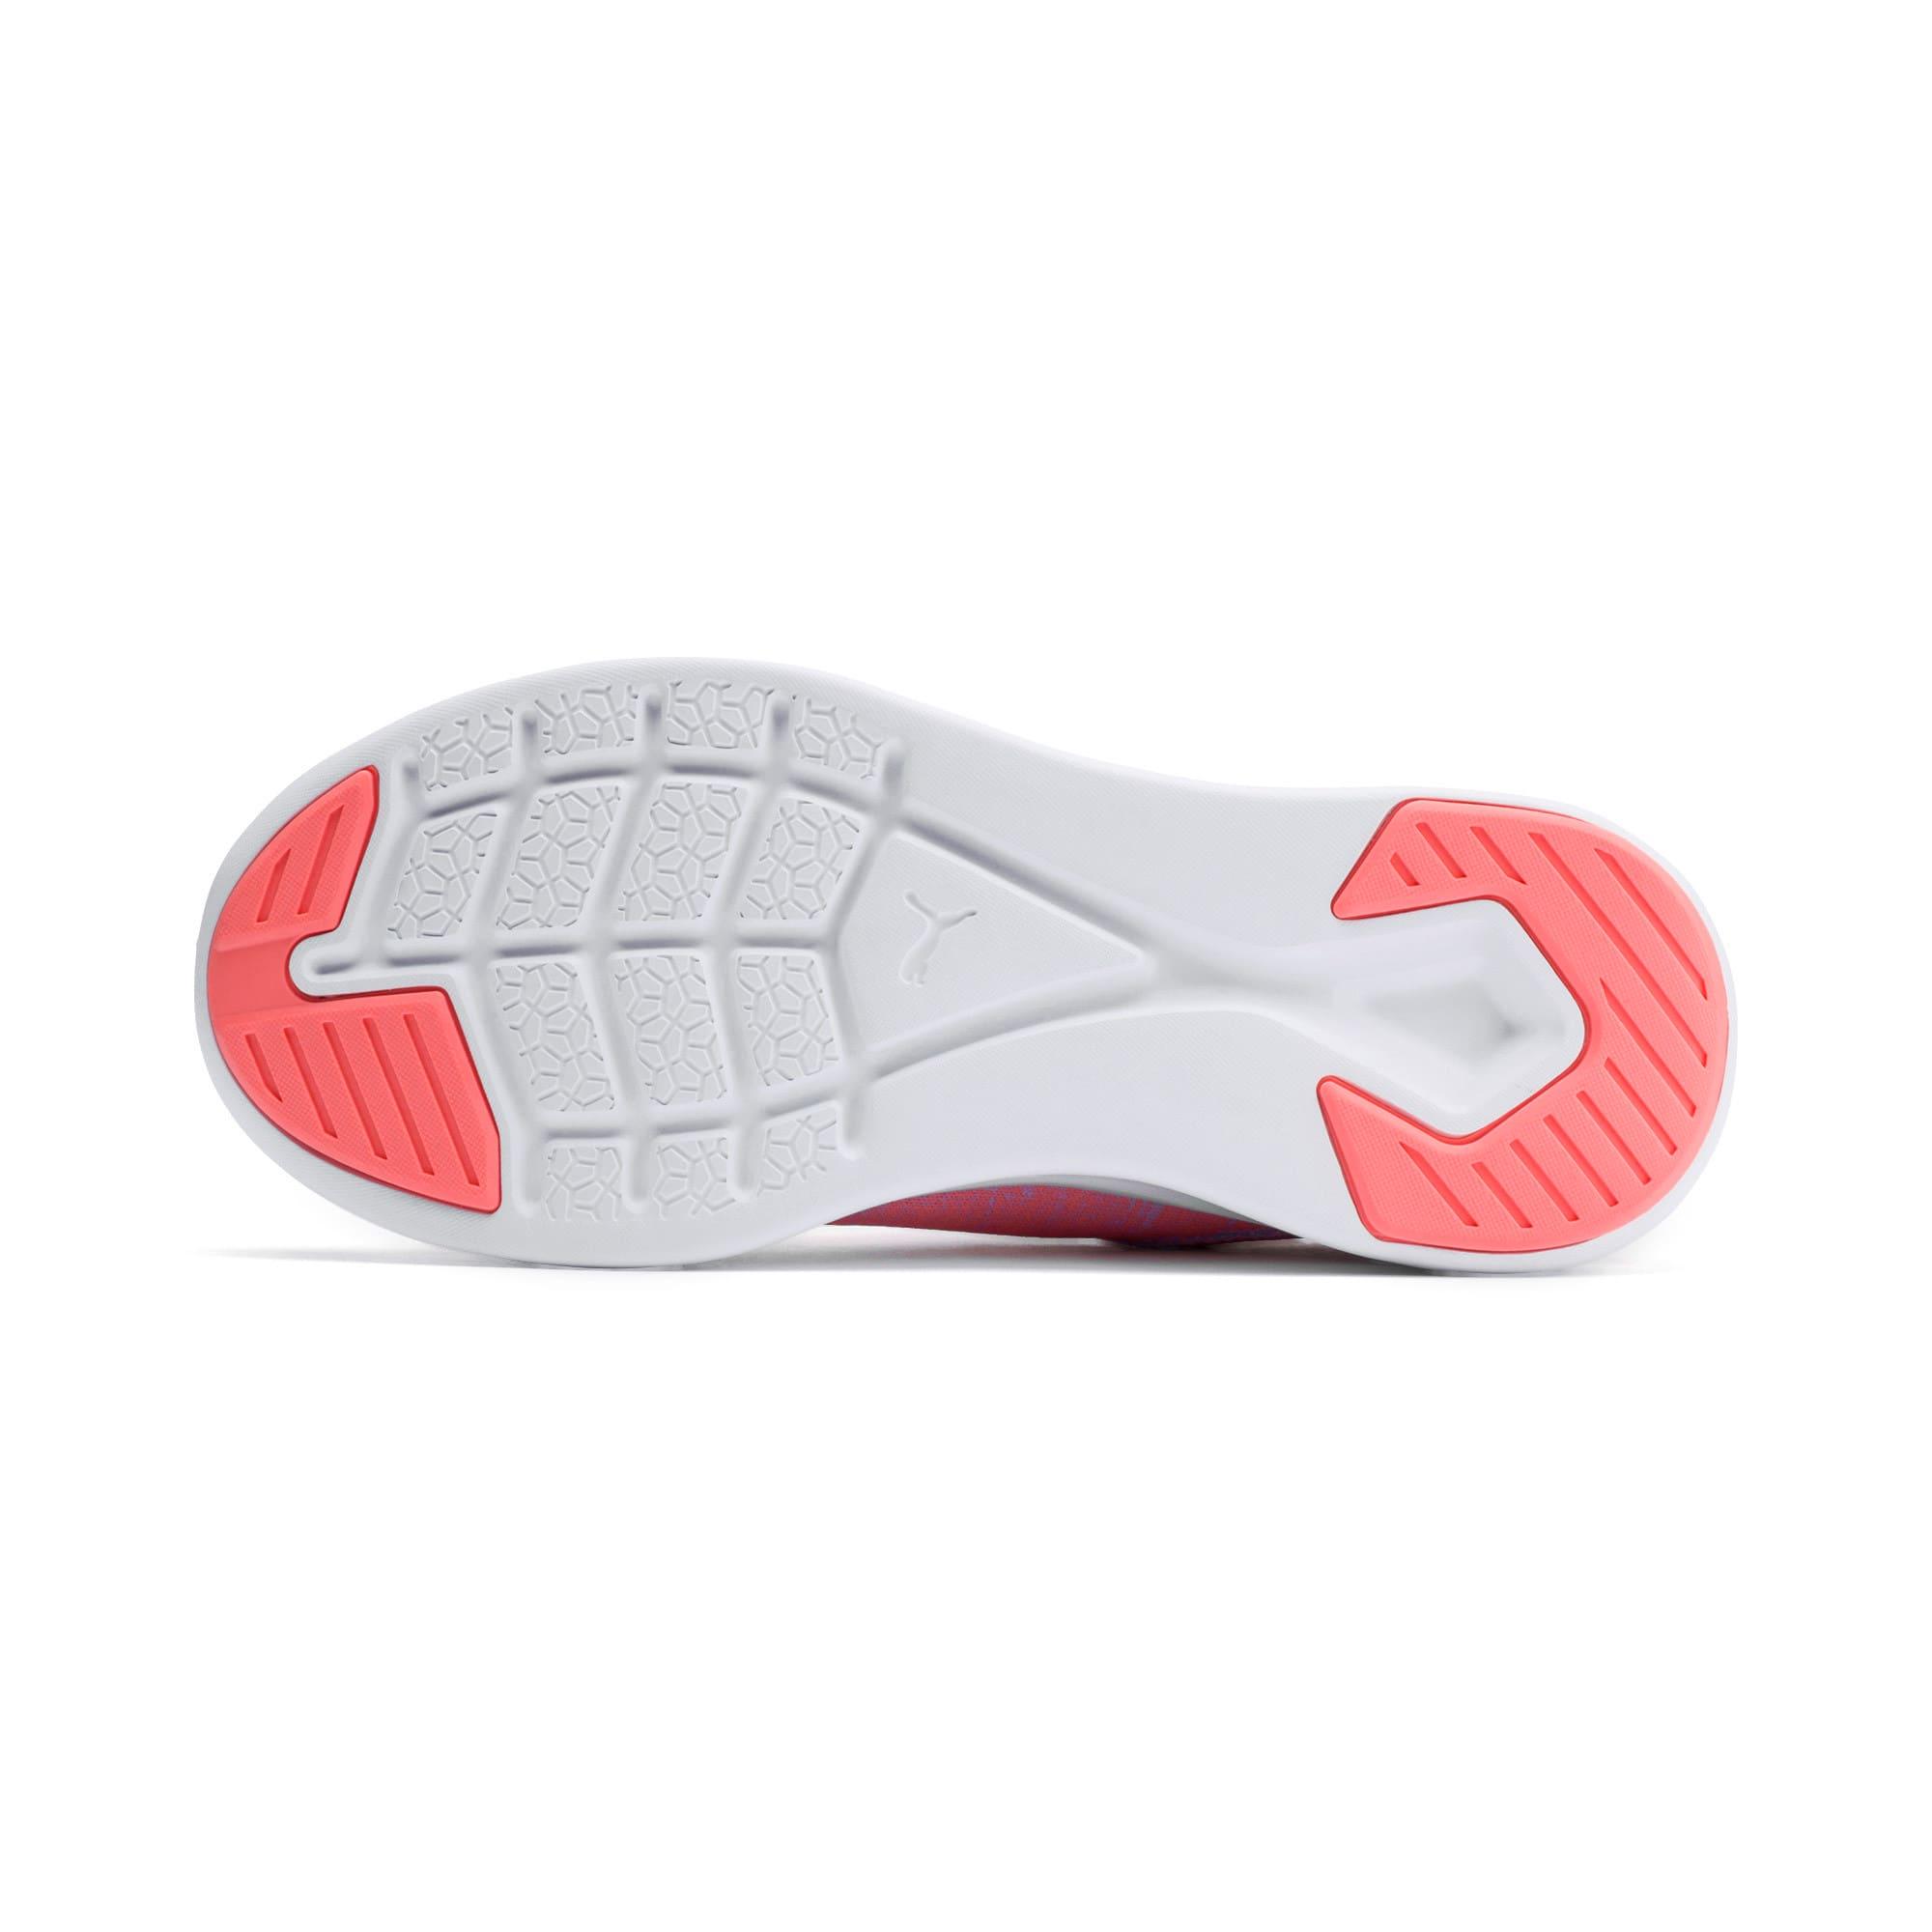 Thumbnail 5 of IGNITE Flash evoKNIT Women's Running Shoes, Bright Peach-Puma White, medium